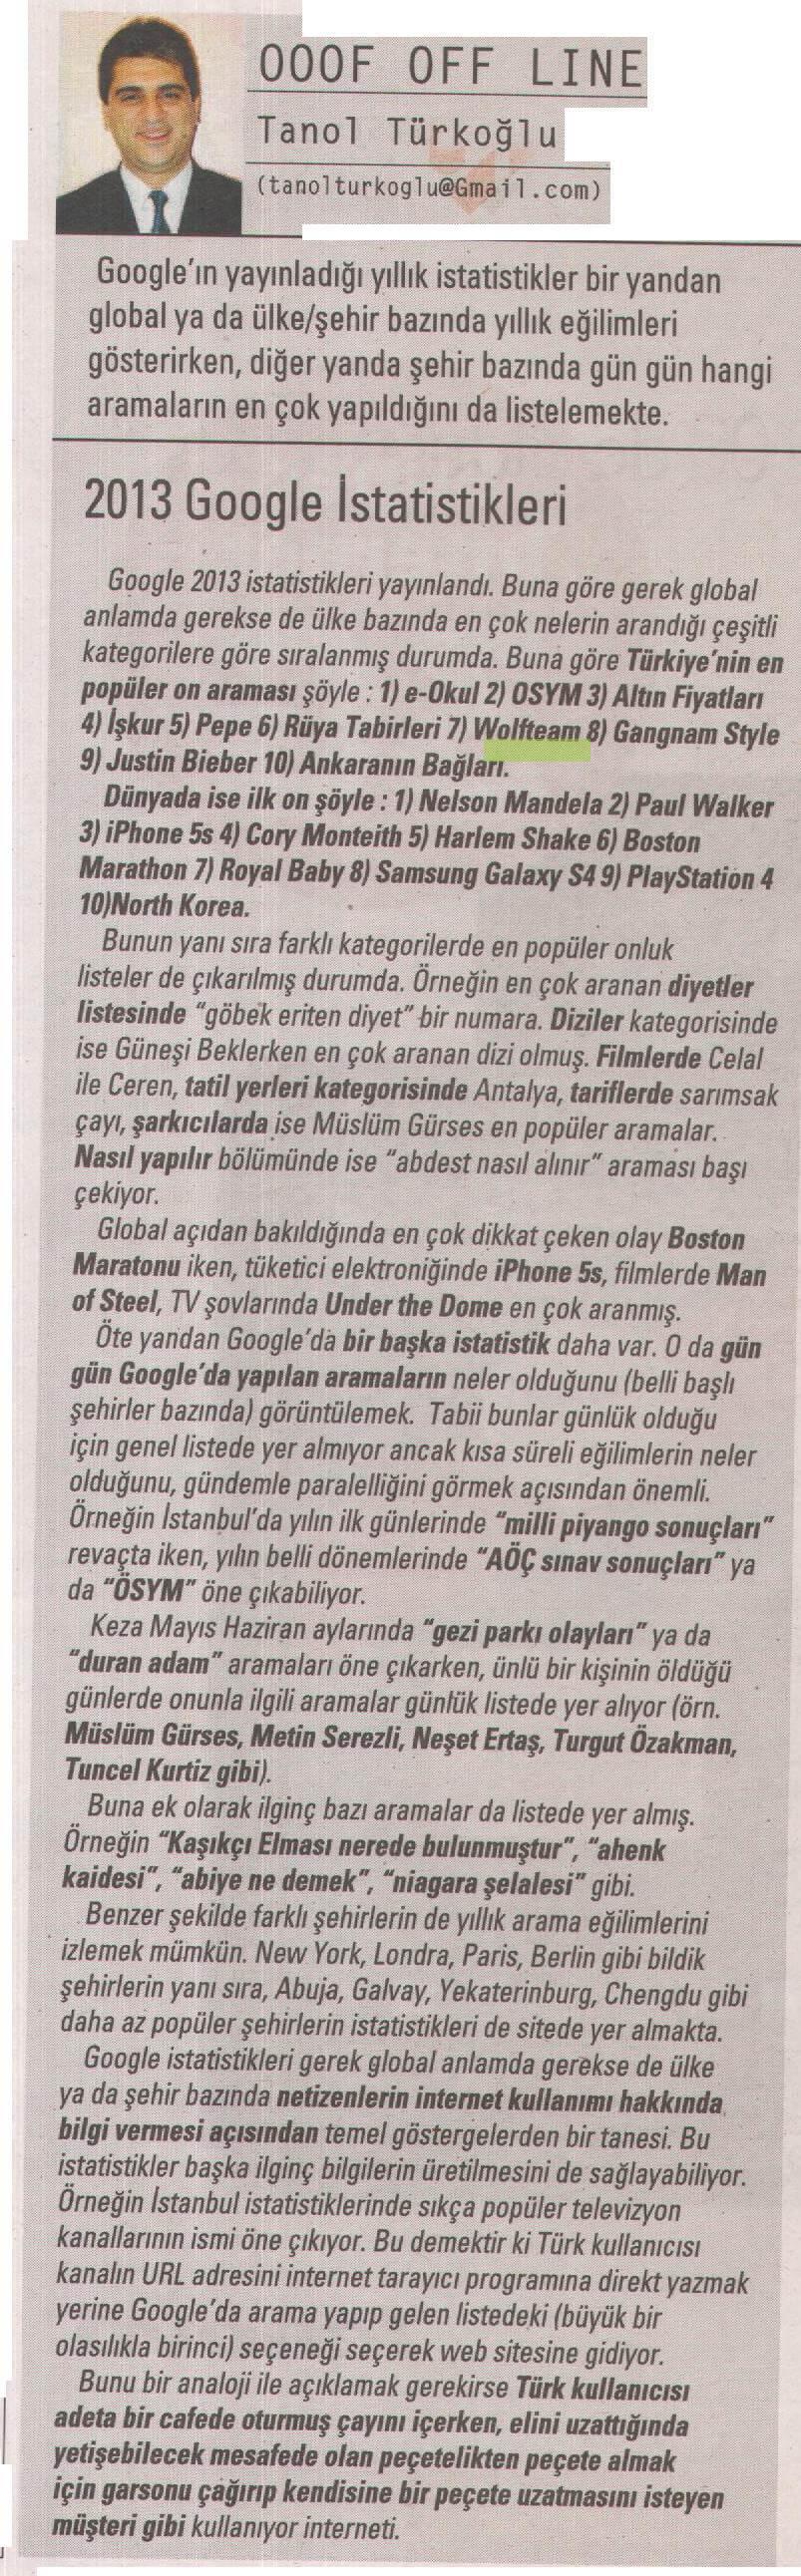 joygame basin yansimalari cumhuriyet gazetesi 27 10